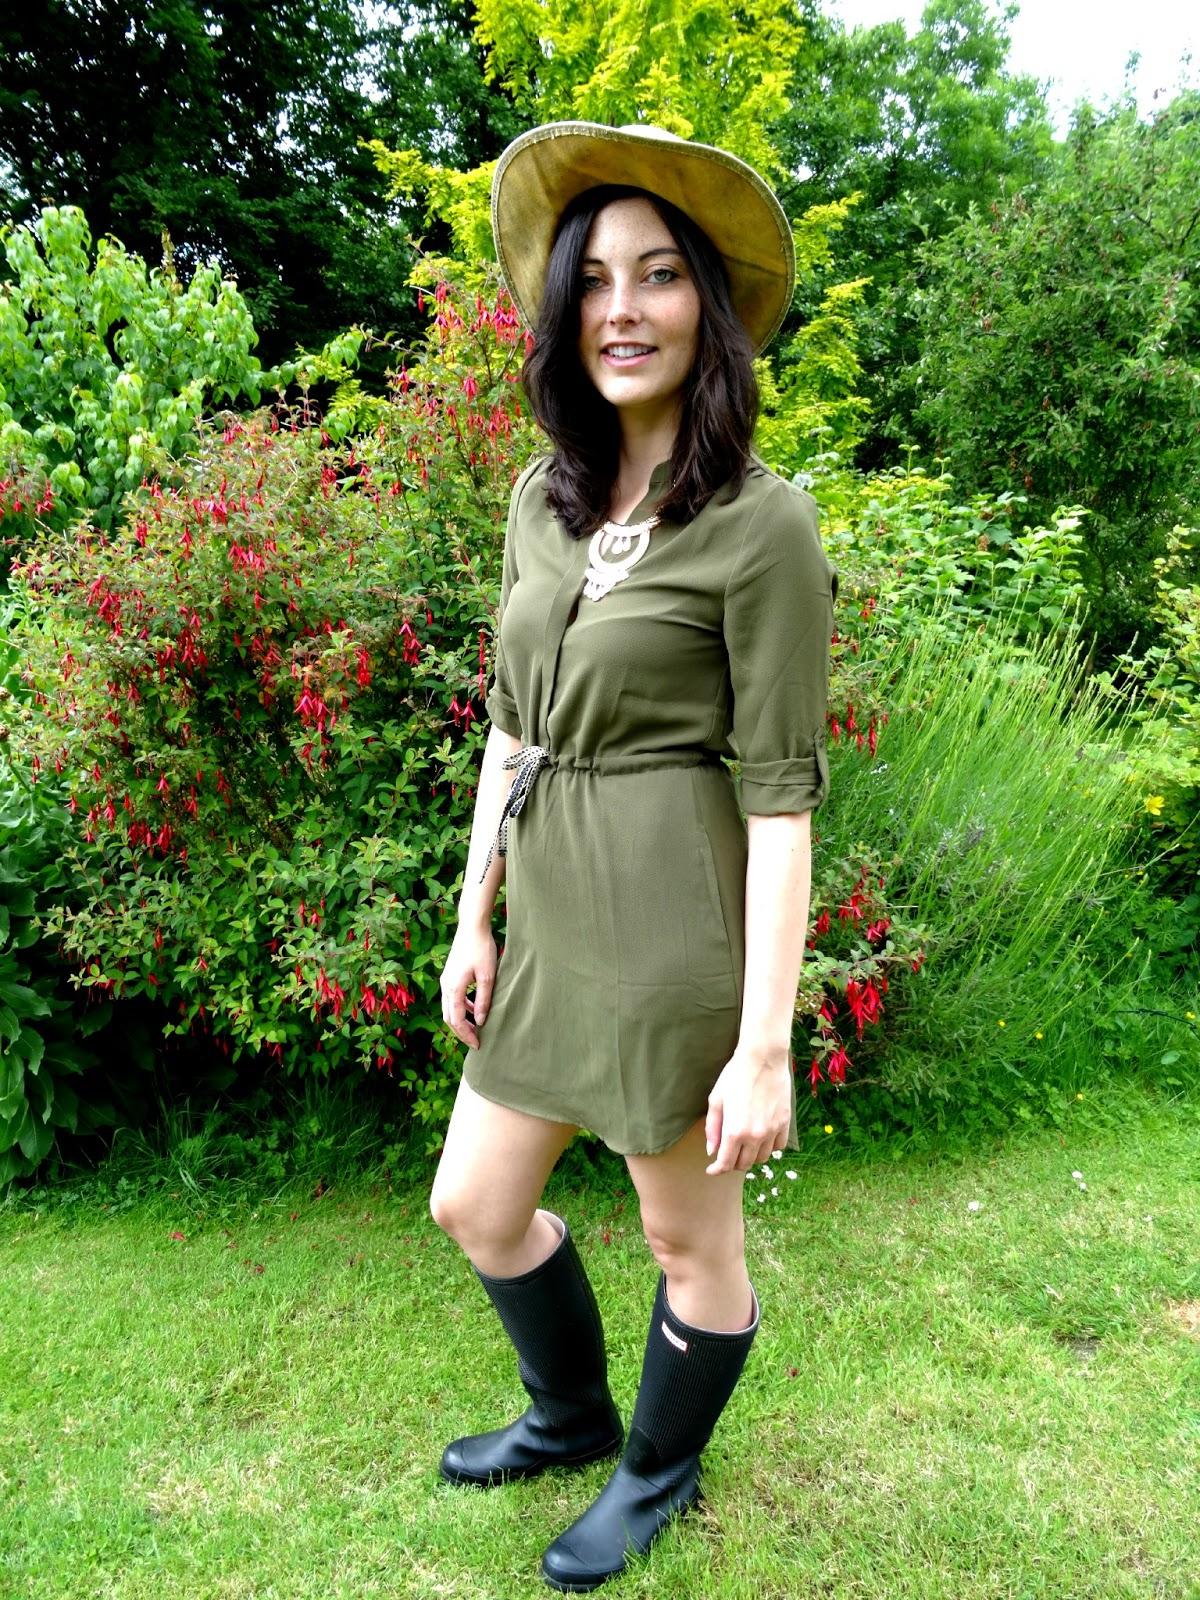 Glastonbury festival fashion post